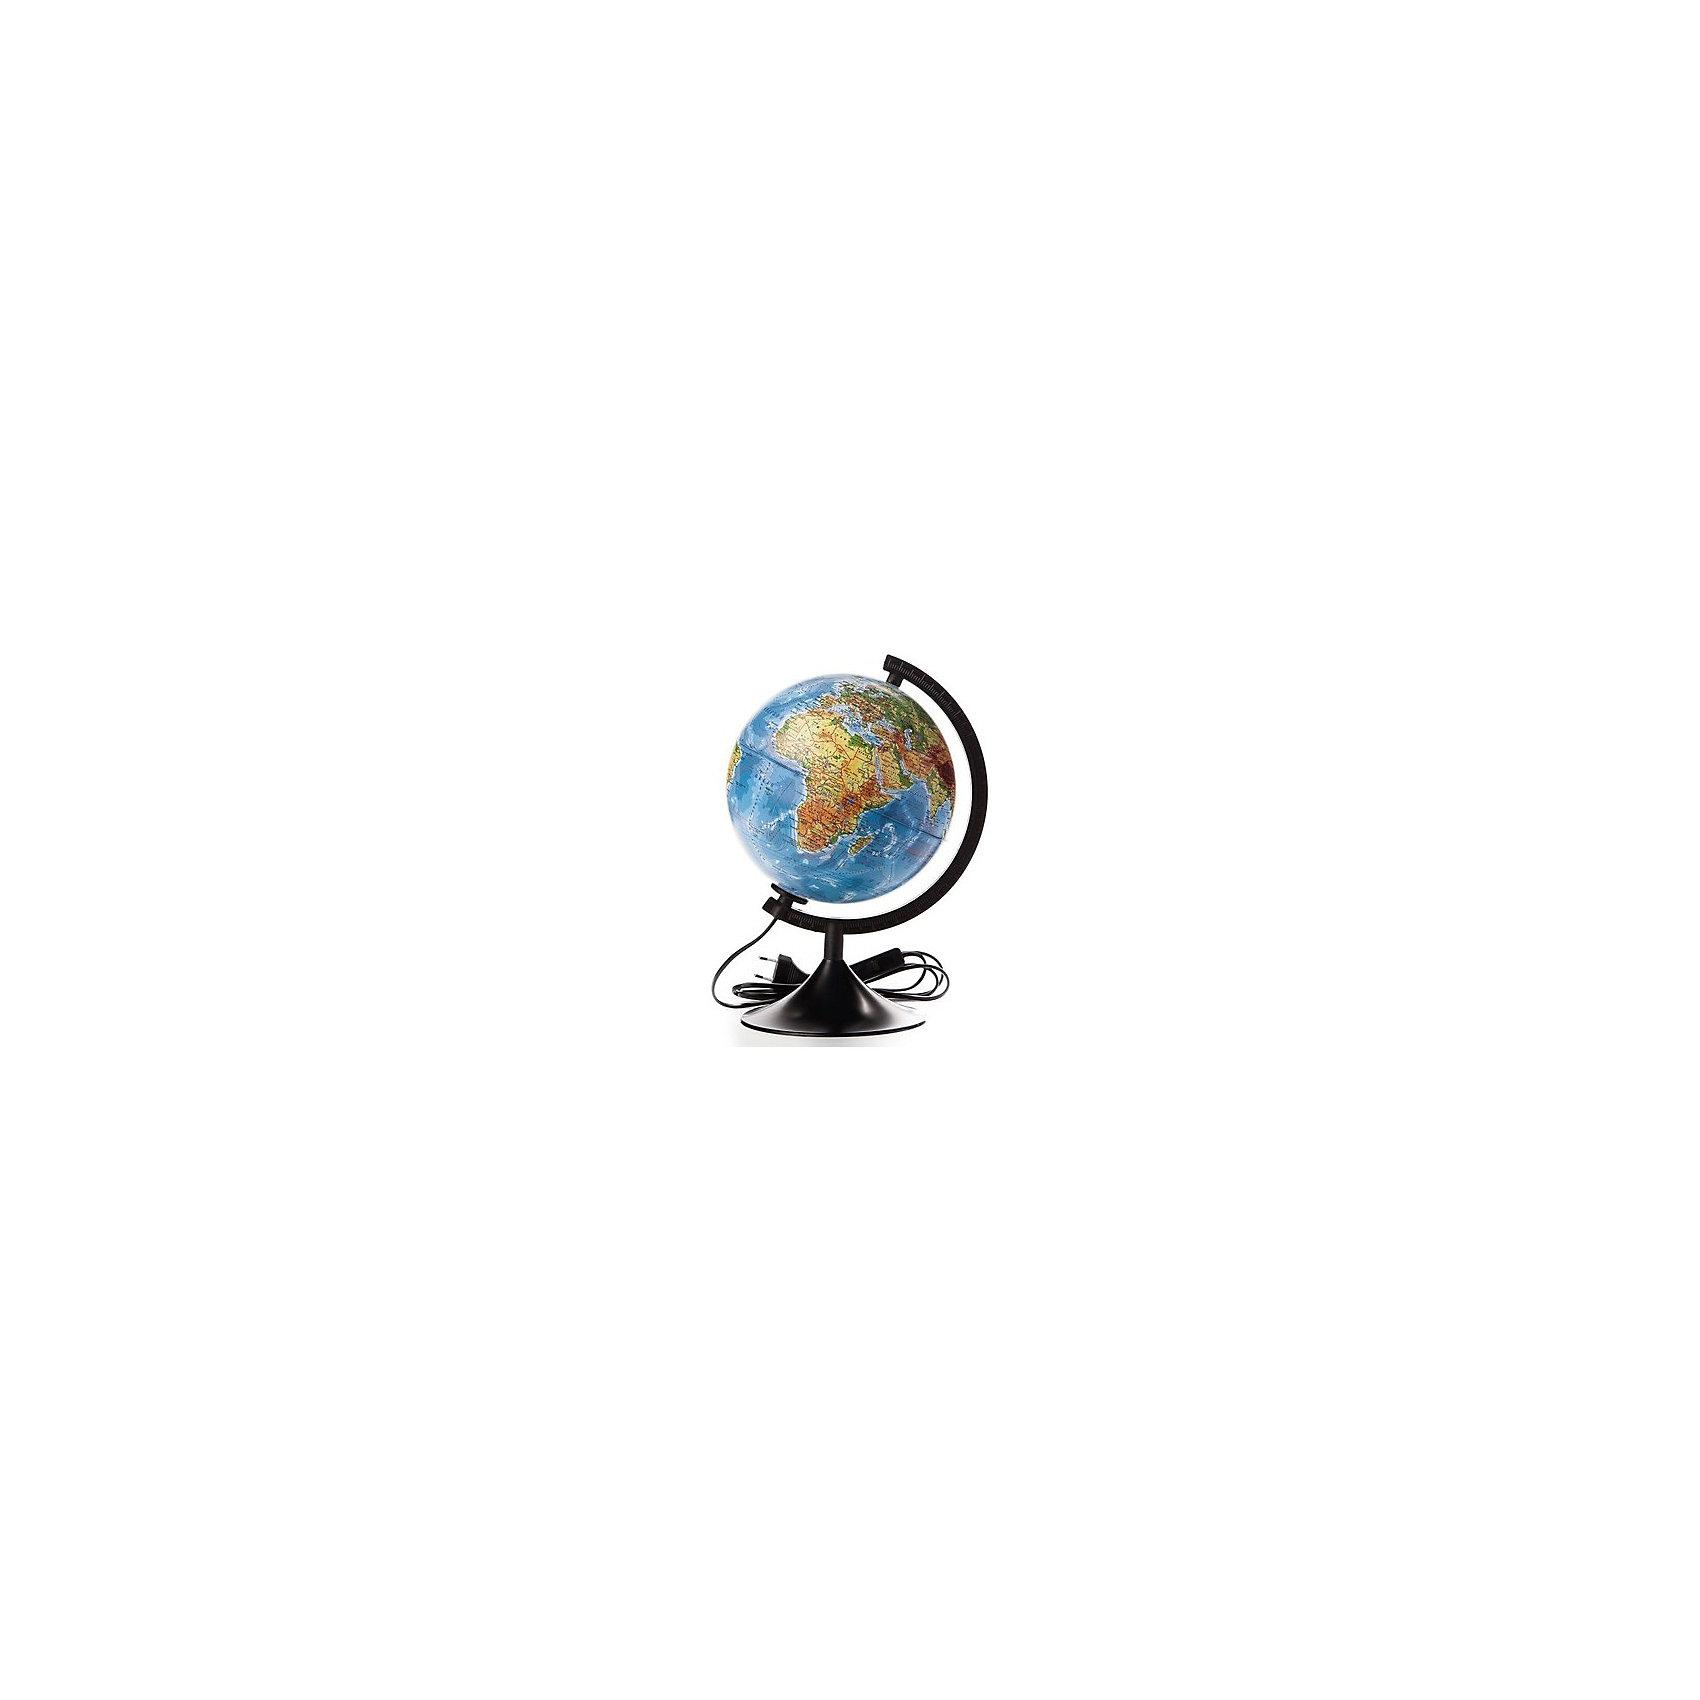 Глобус Земли физический с подсветкой, диаметр 210 ммГлобус Земли д-р 210 физический с подсветкой<br><br>Ширина мм: 230<br>Глубина мм: 210<br>Высота мм: 210<br>Вес г: 500<br>Возраст от месяцев: 72<br>Возраст до месяцев: 2147483647<br>Пол: Унисекс<br>Возраст: Детский<br>SKU: 5504461